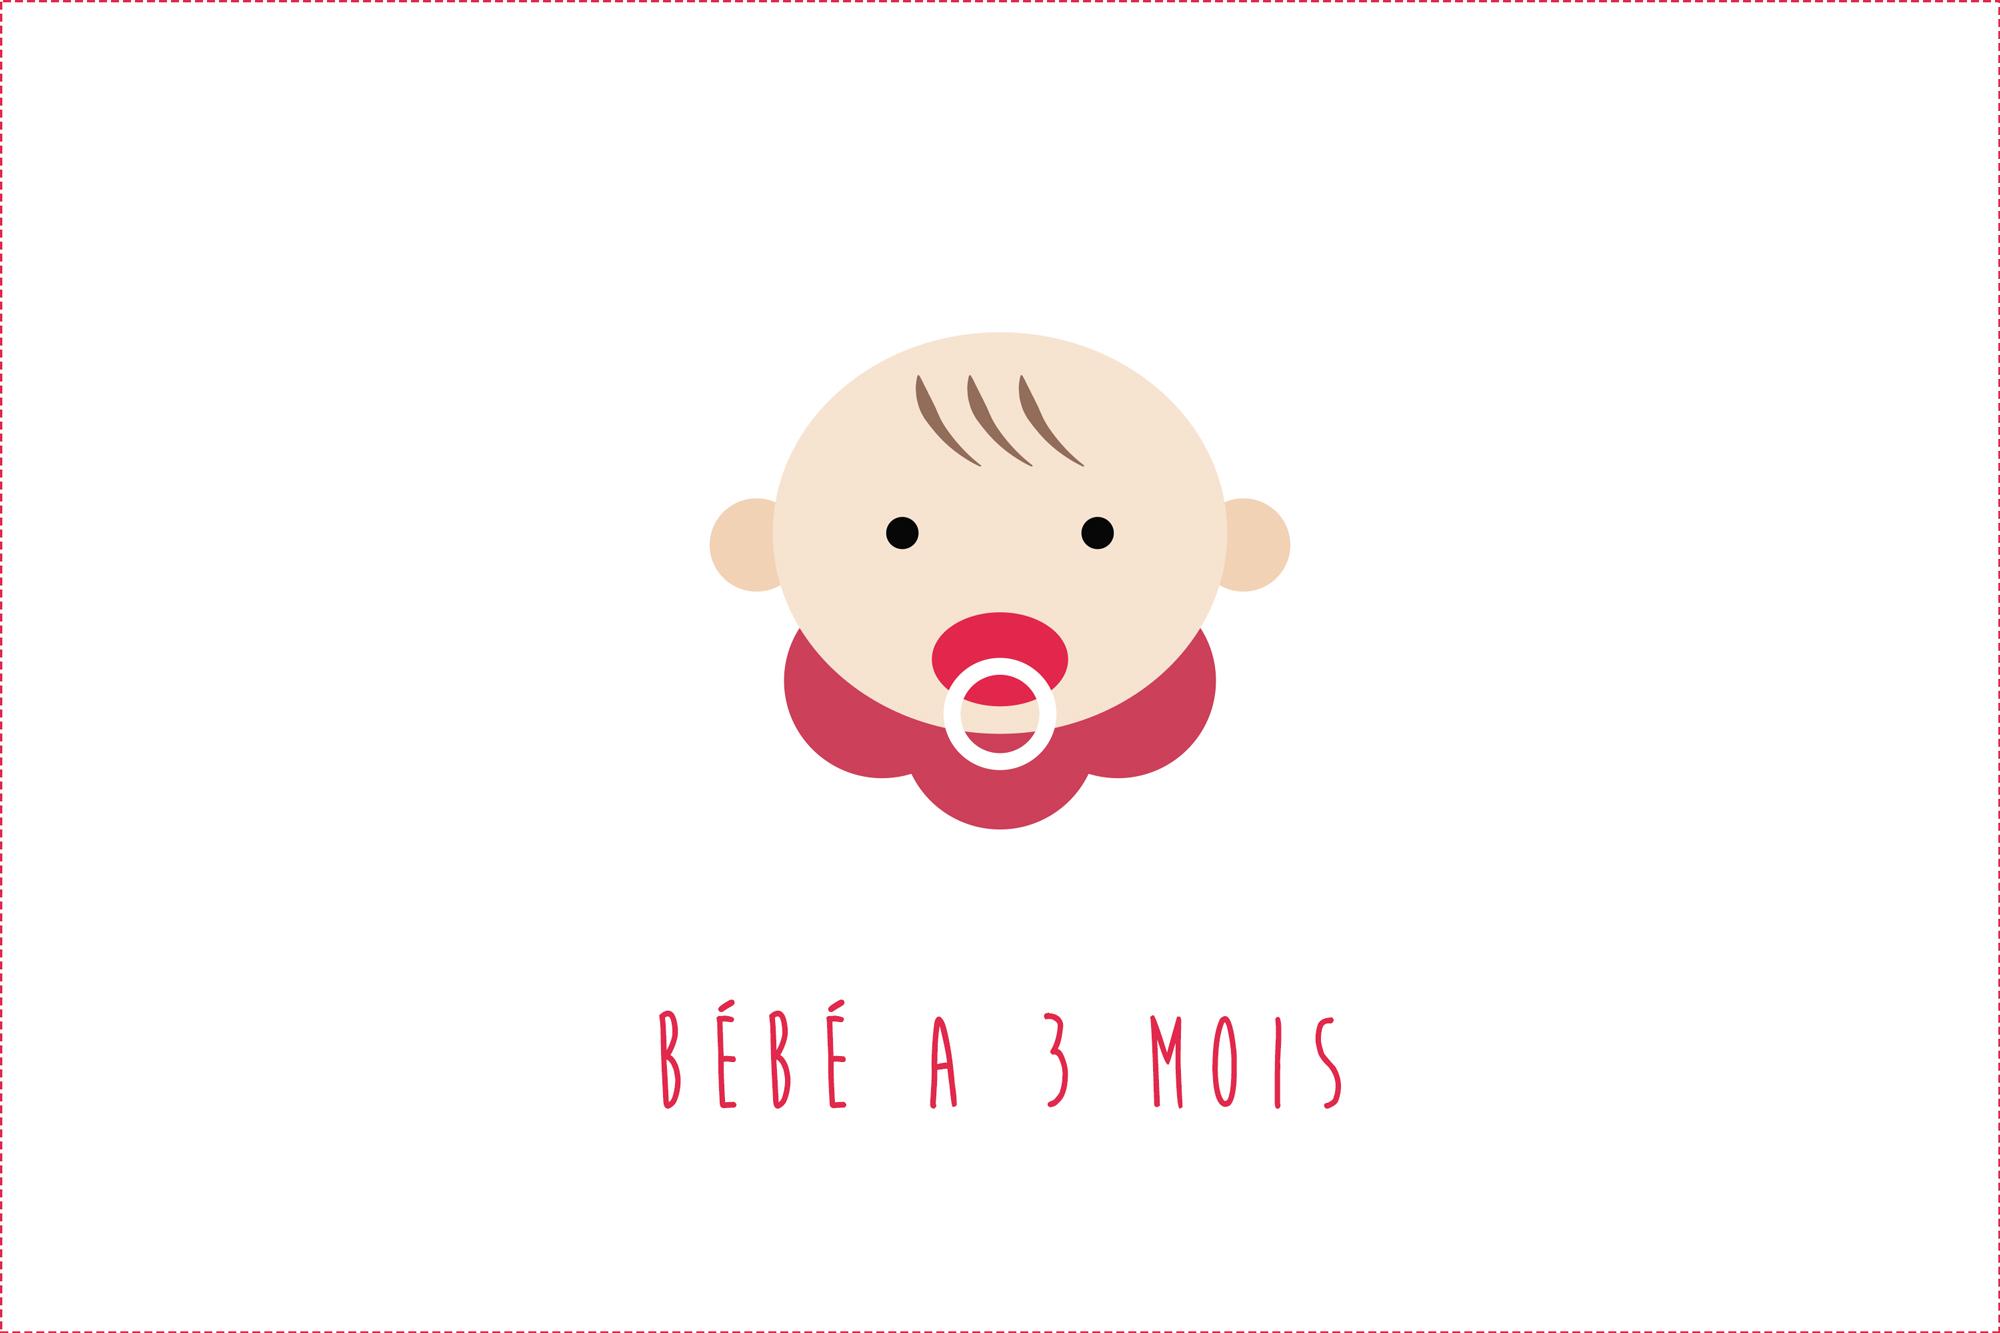 Bébé a 3 mois